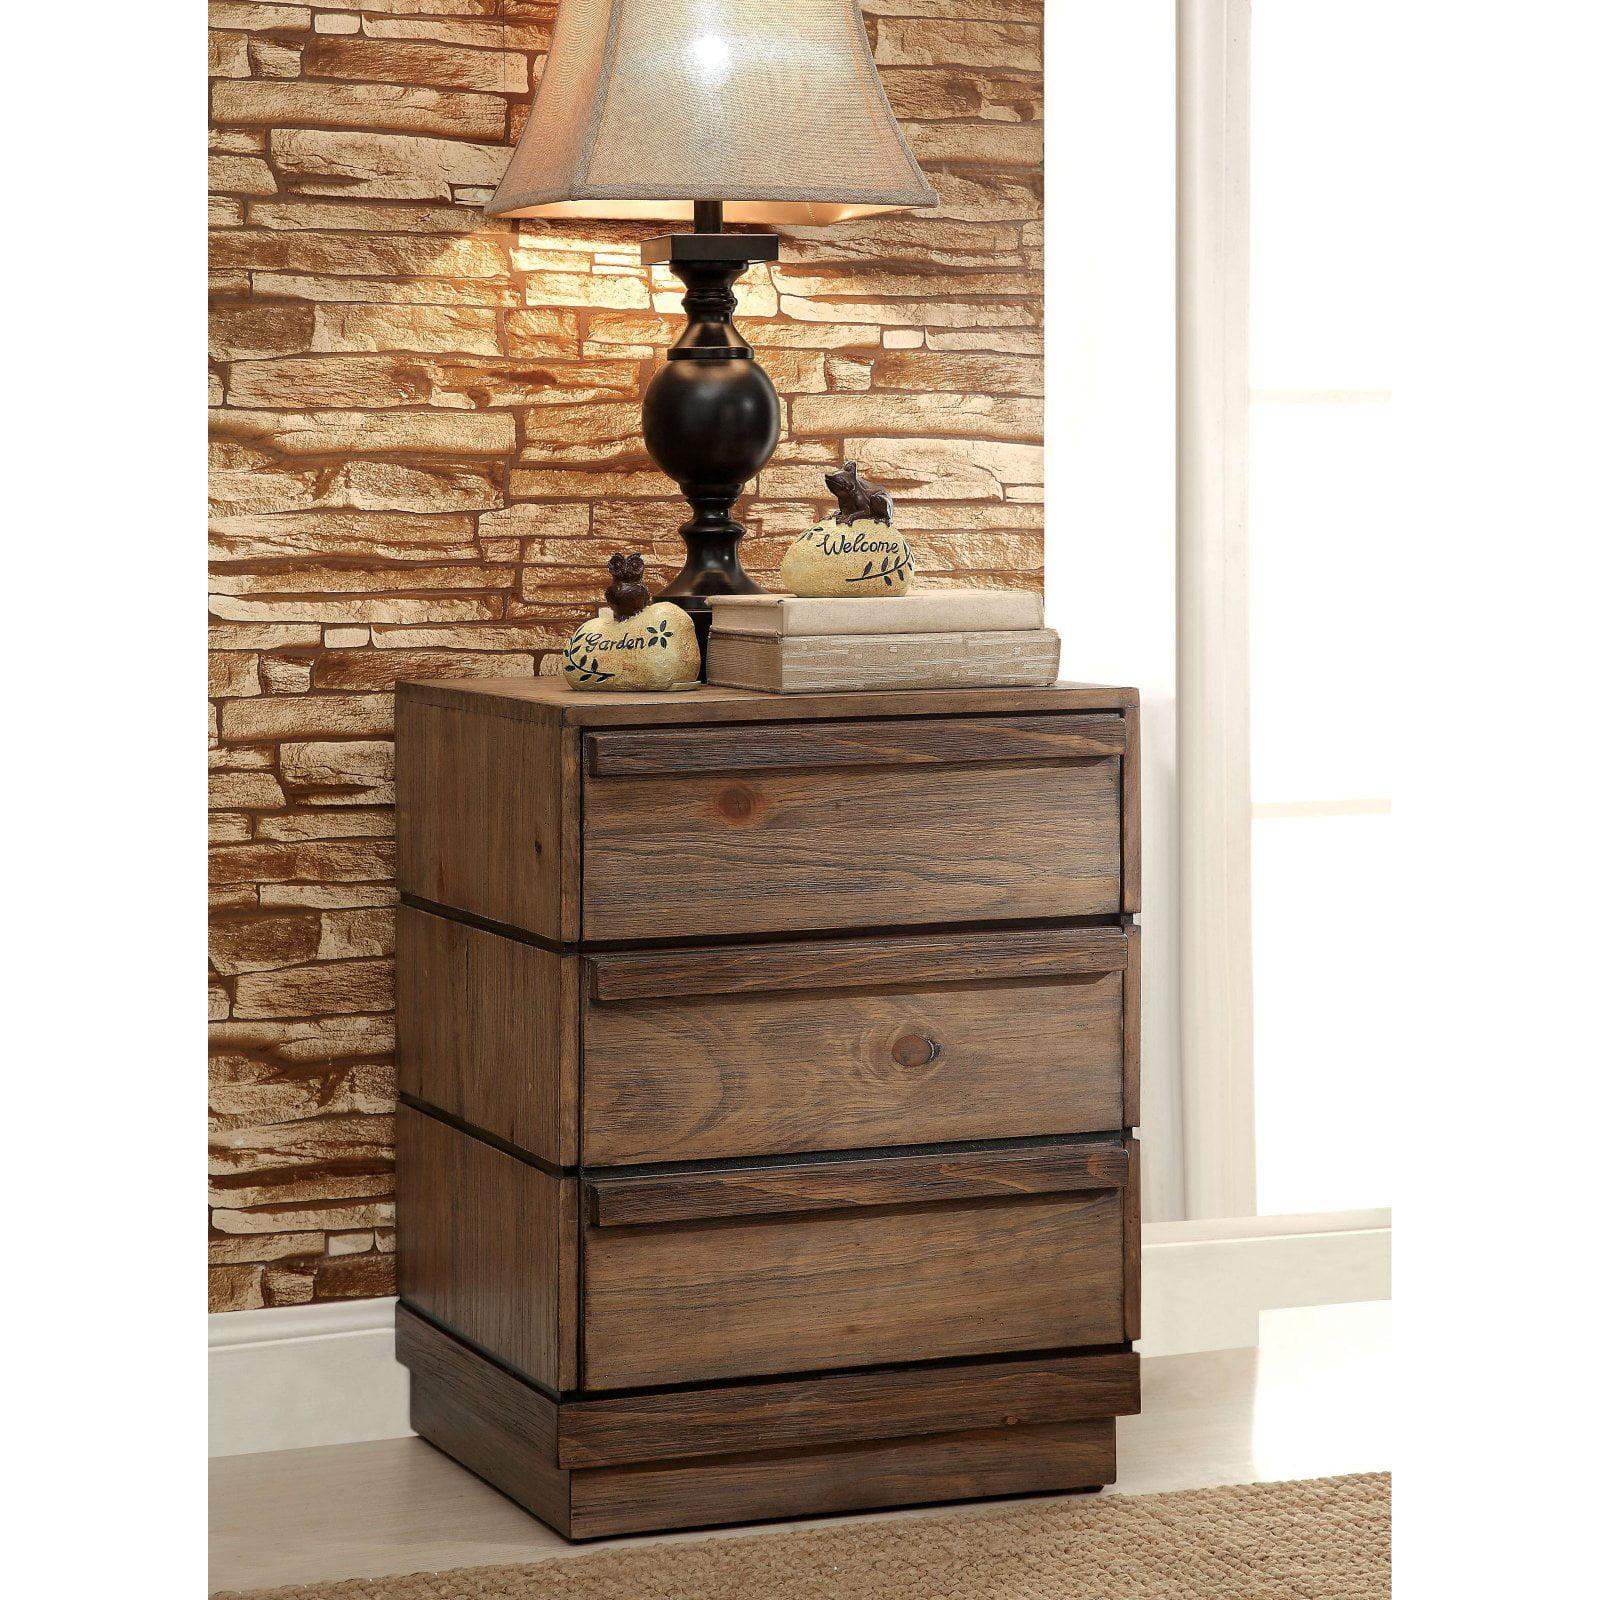 Furniture of America Tybalt 3 Drawer Nightstand